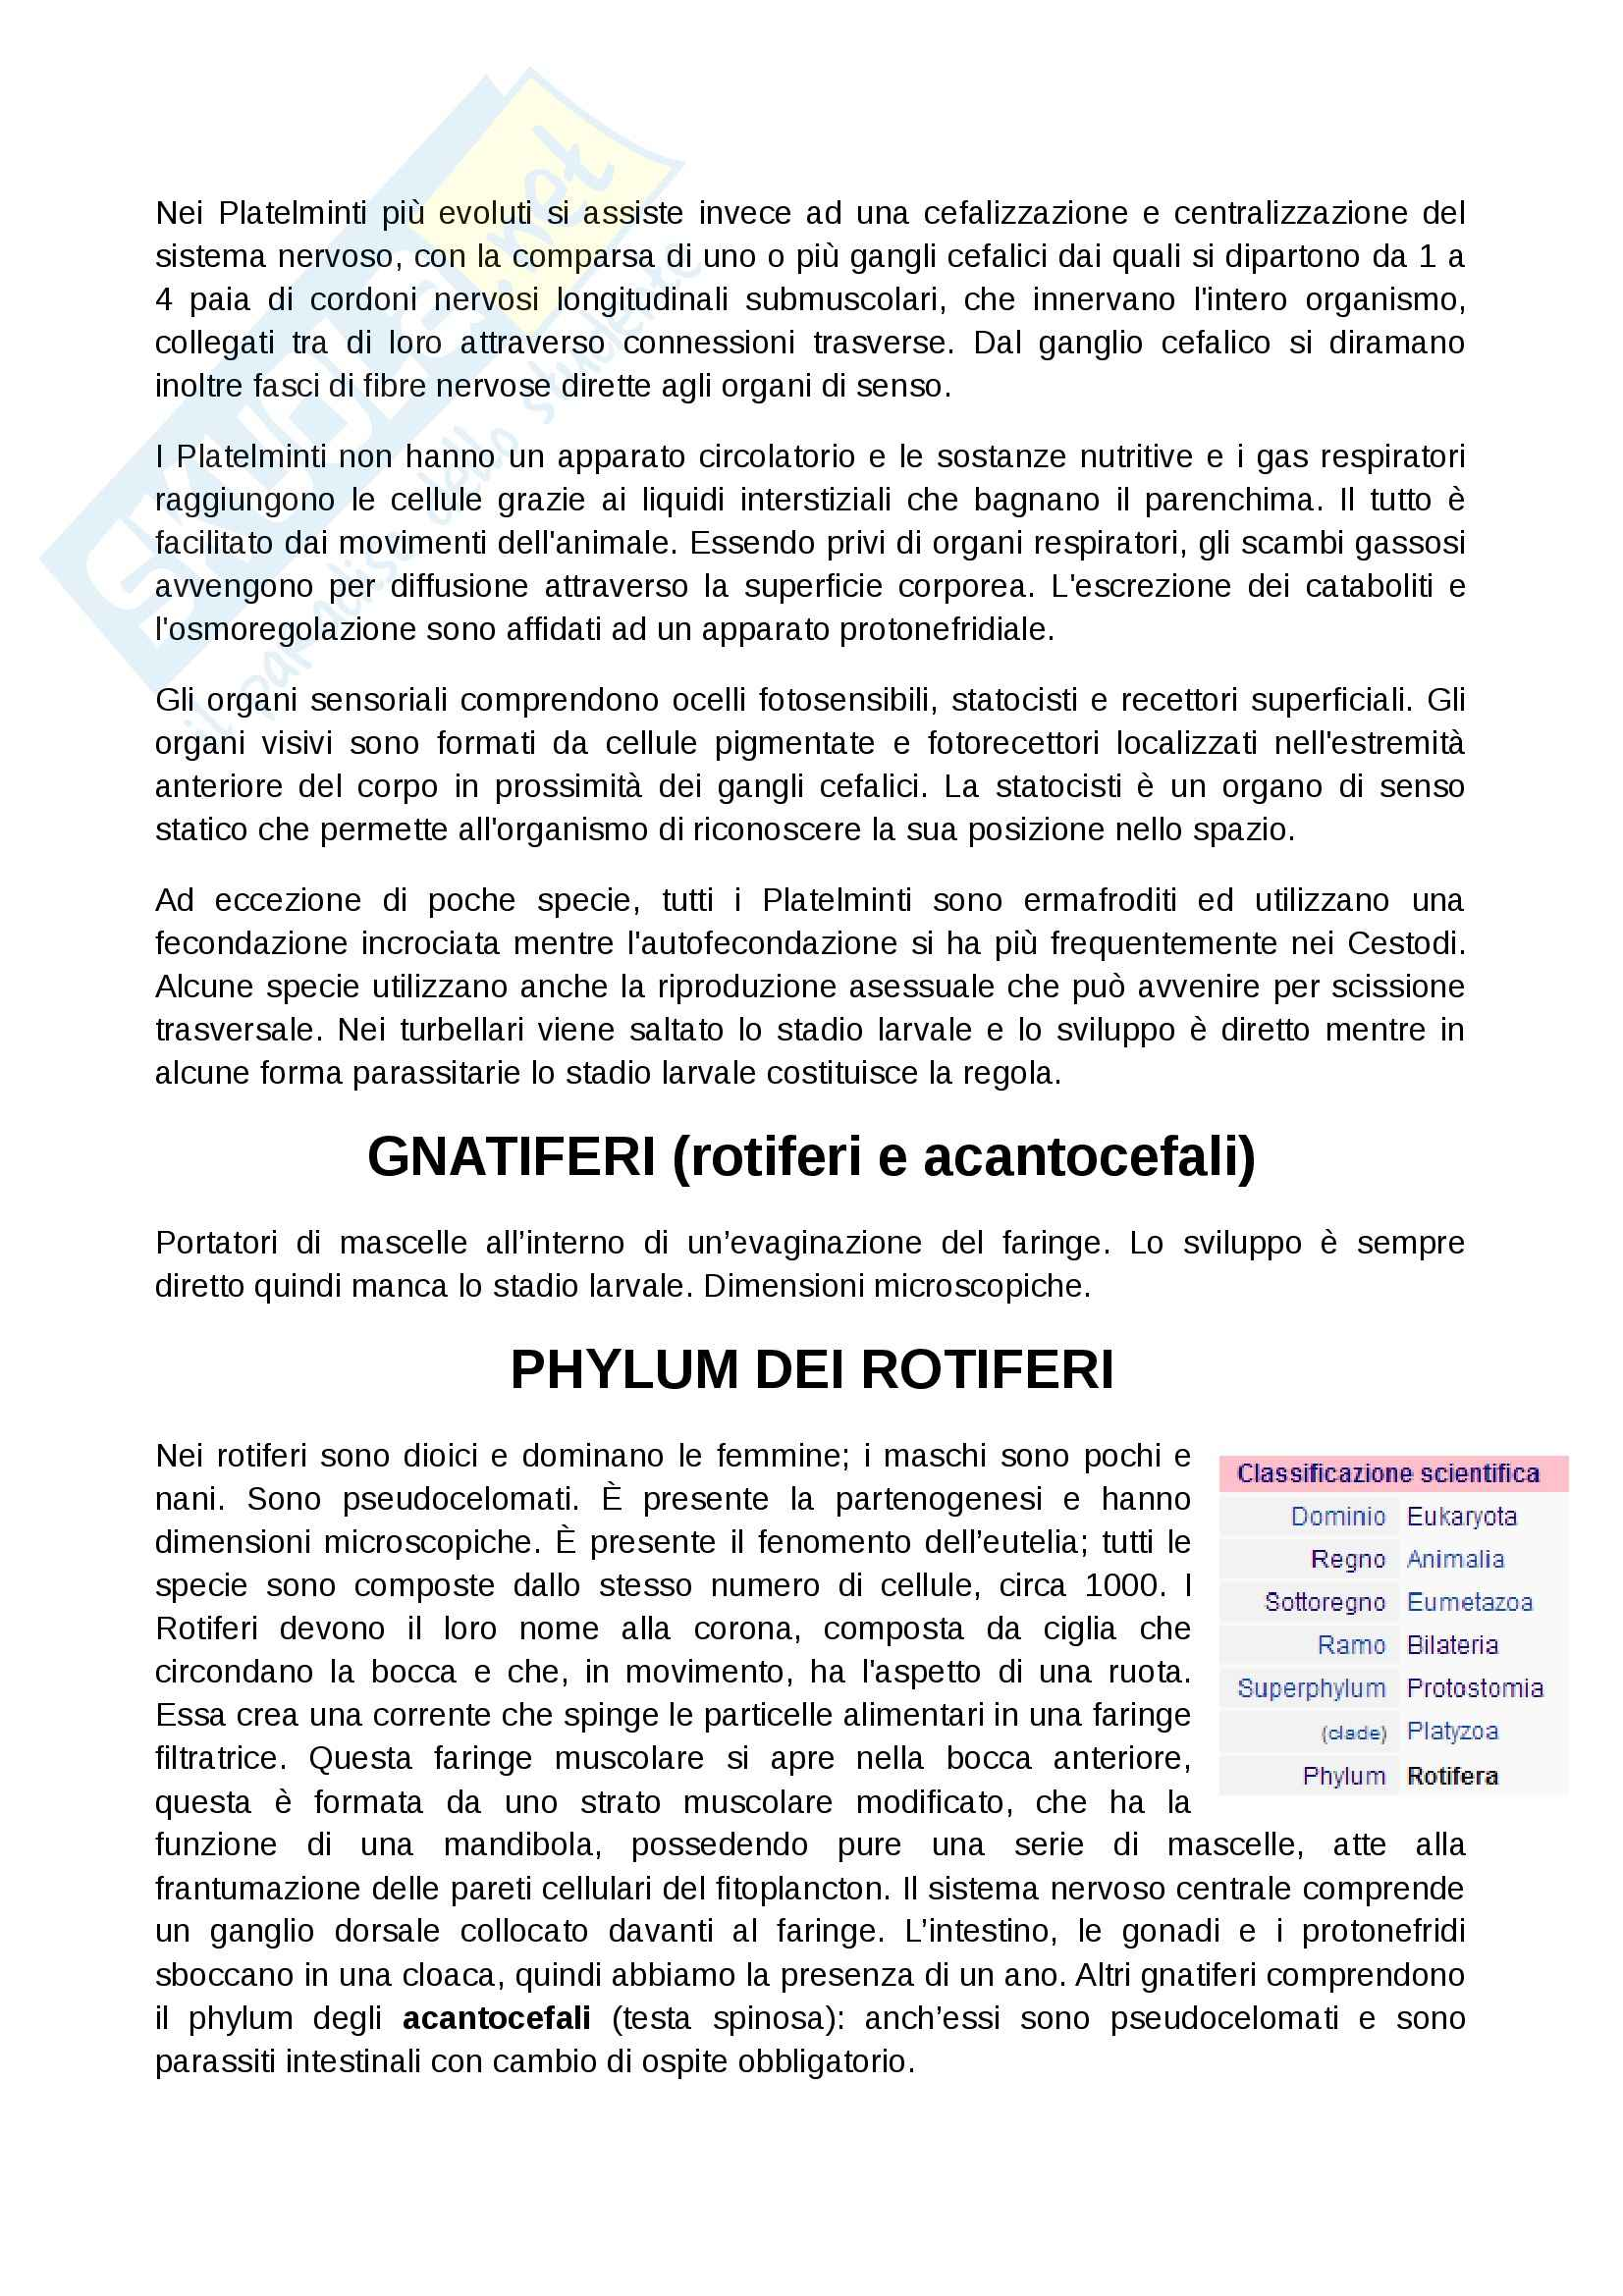 Zoologia  - Appunti Pag. 6